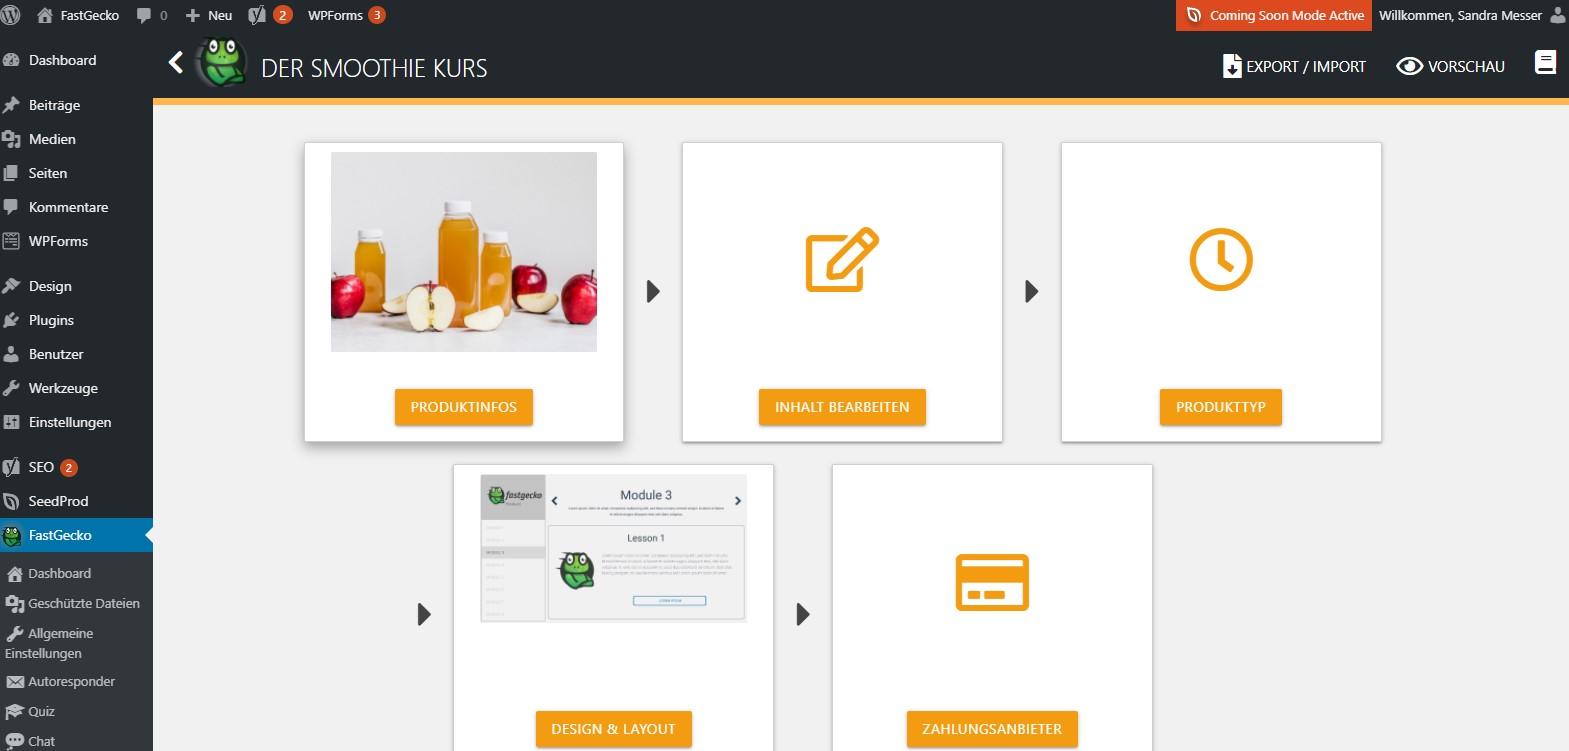 FastGecko Online Kurs erstellen Produkttyp